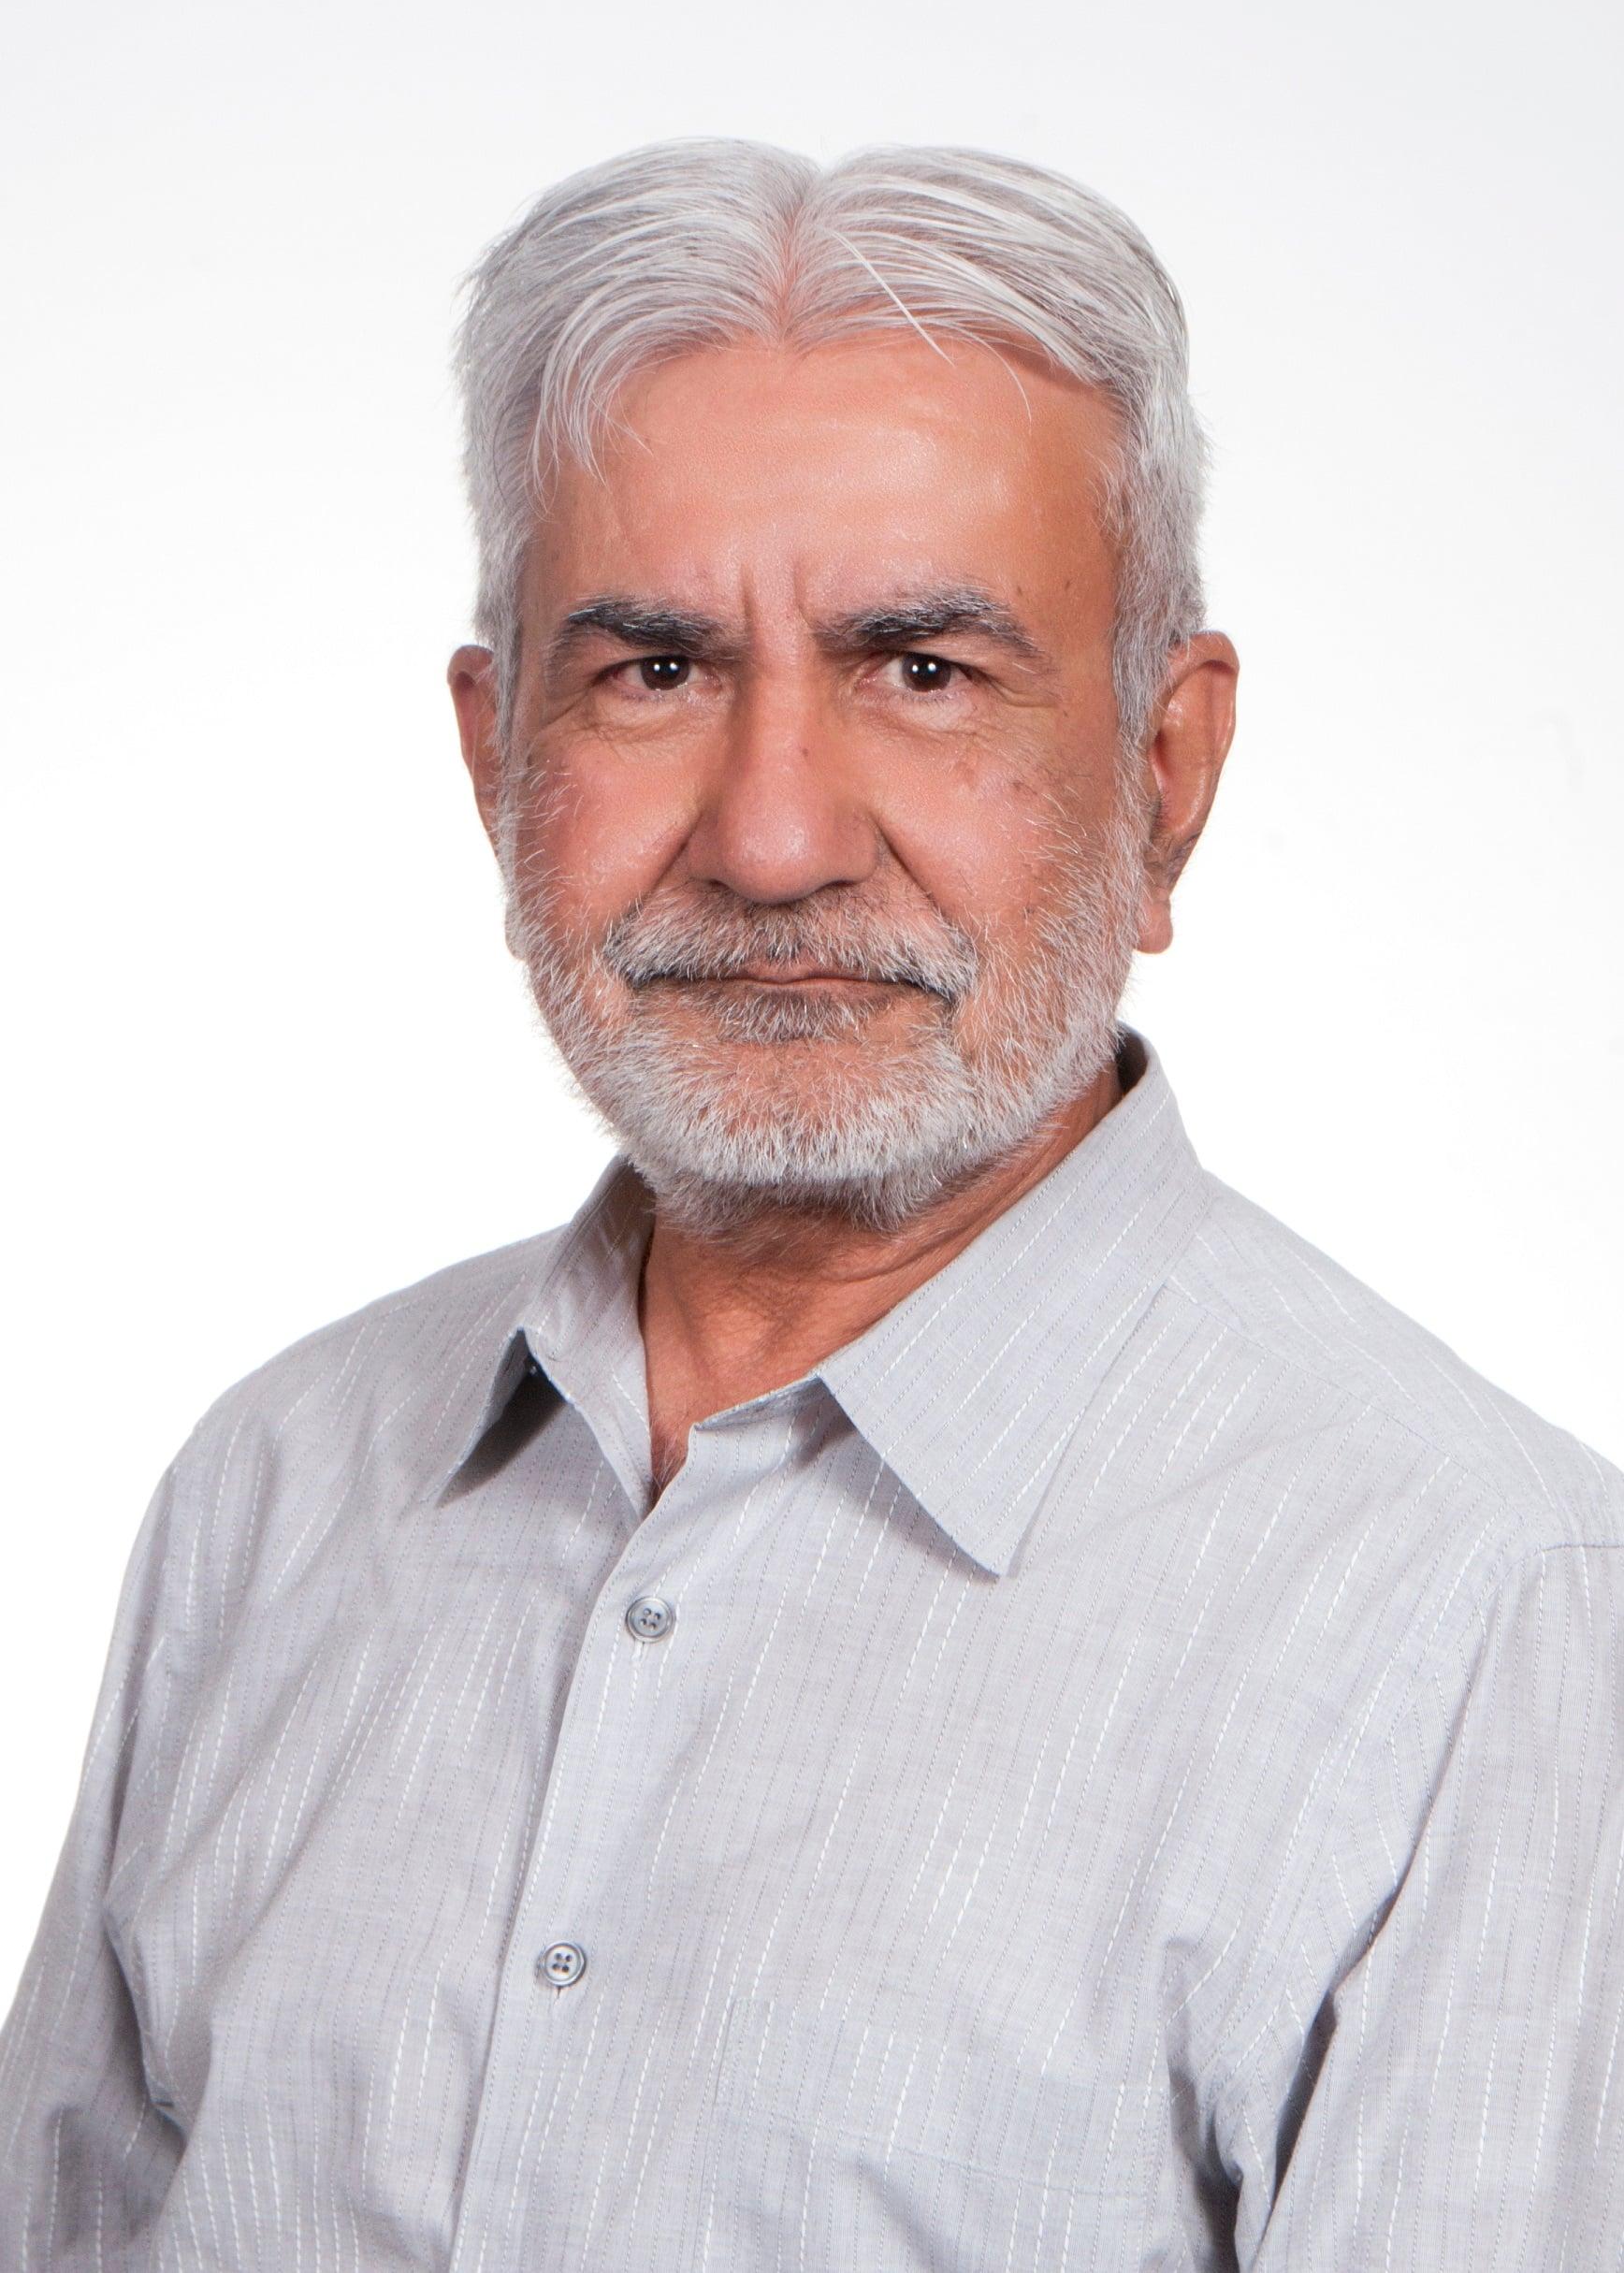 Dr. Ravi K Berry MD